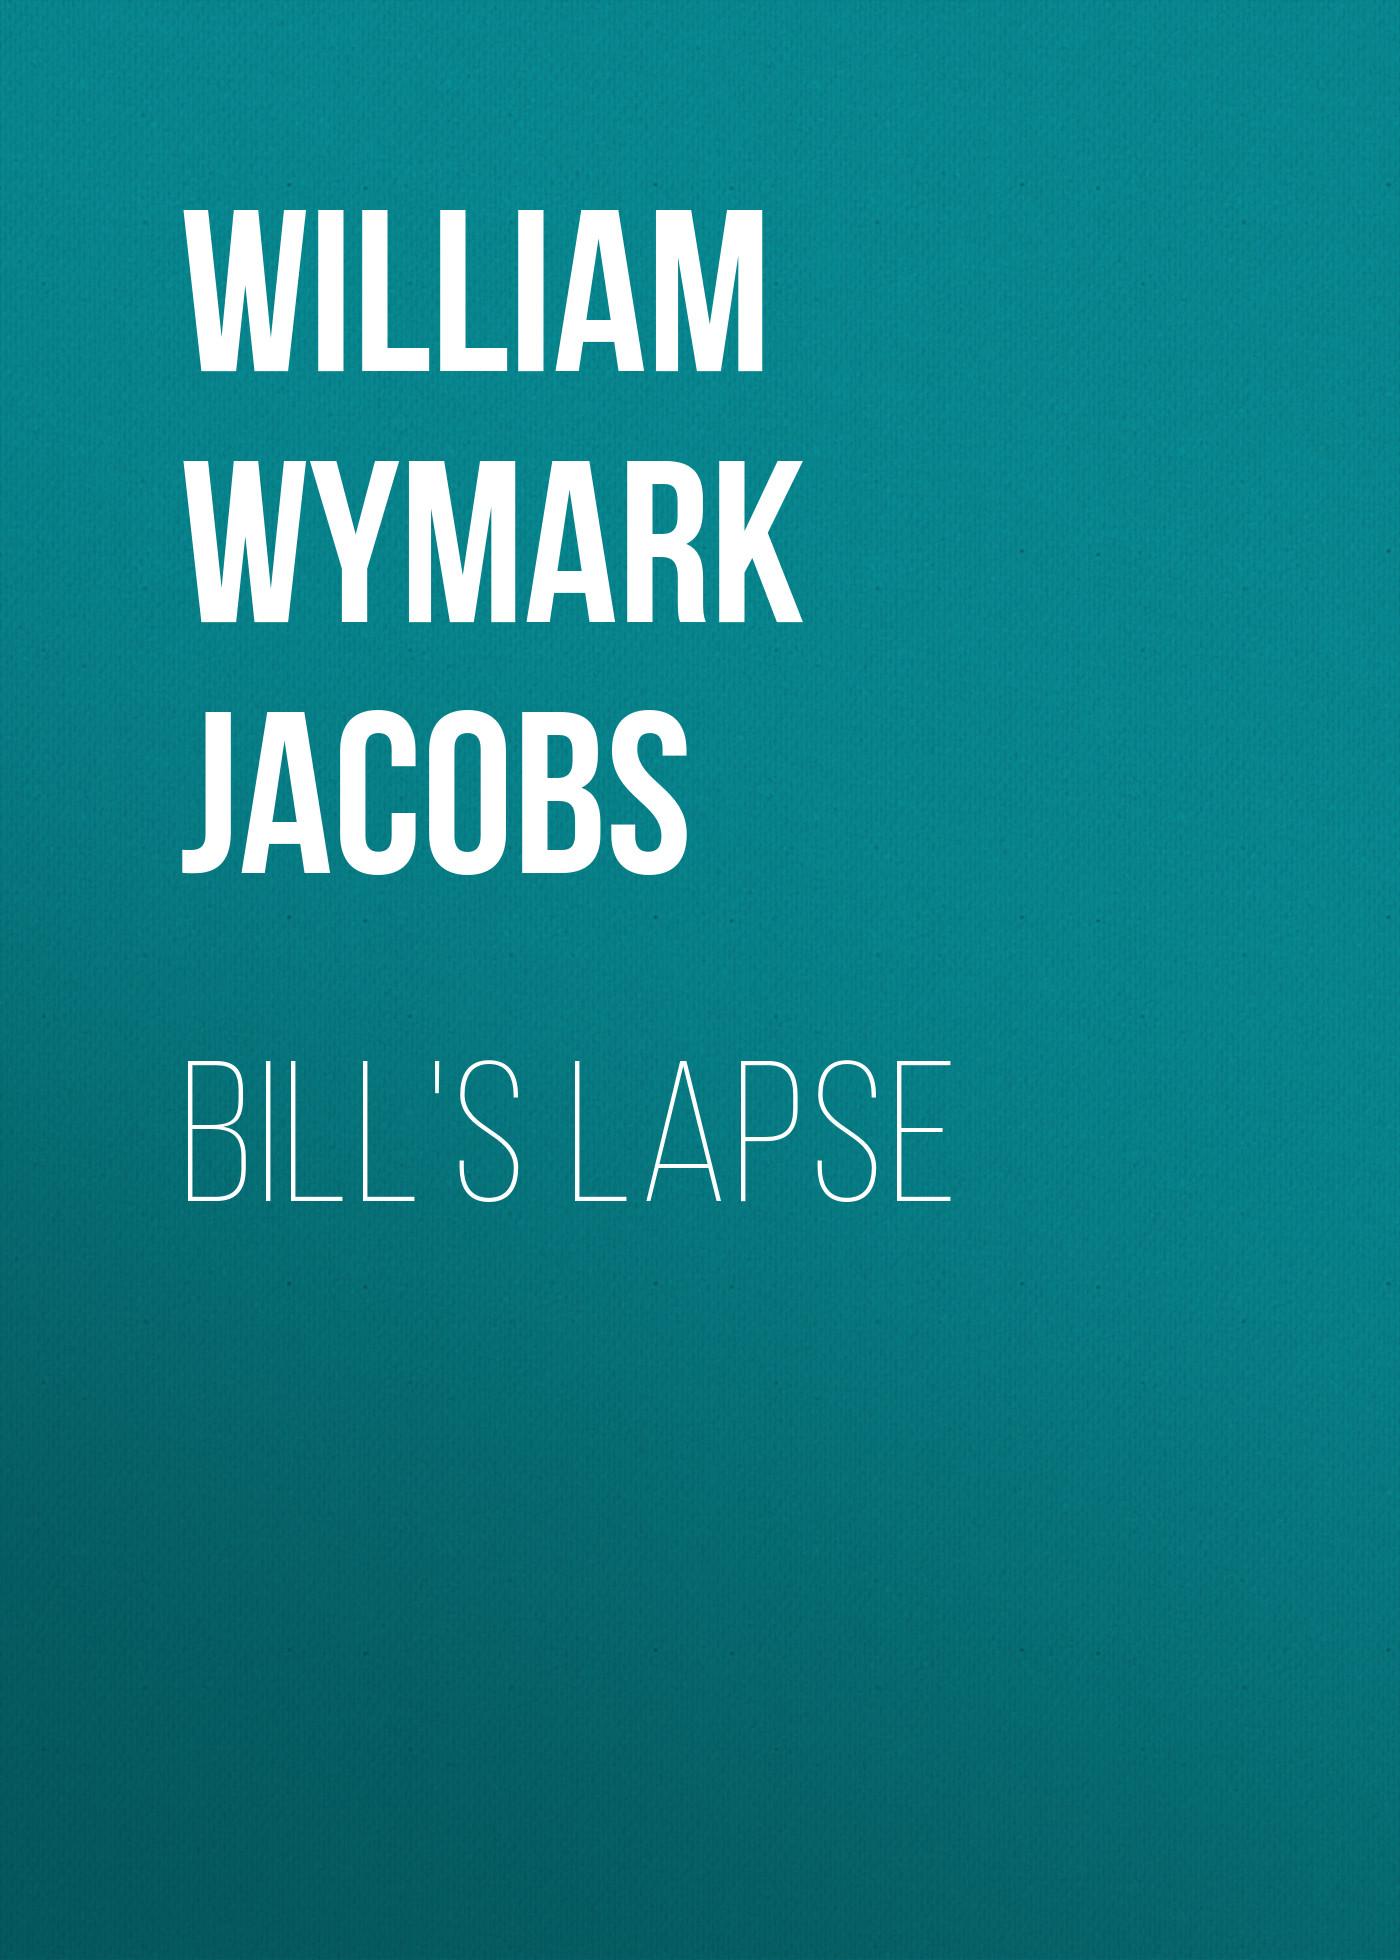 Bill's Lapse